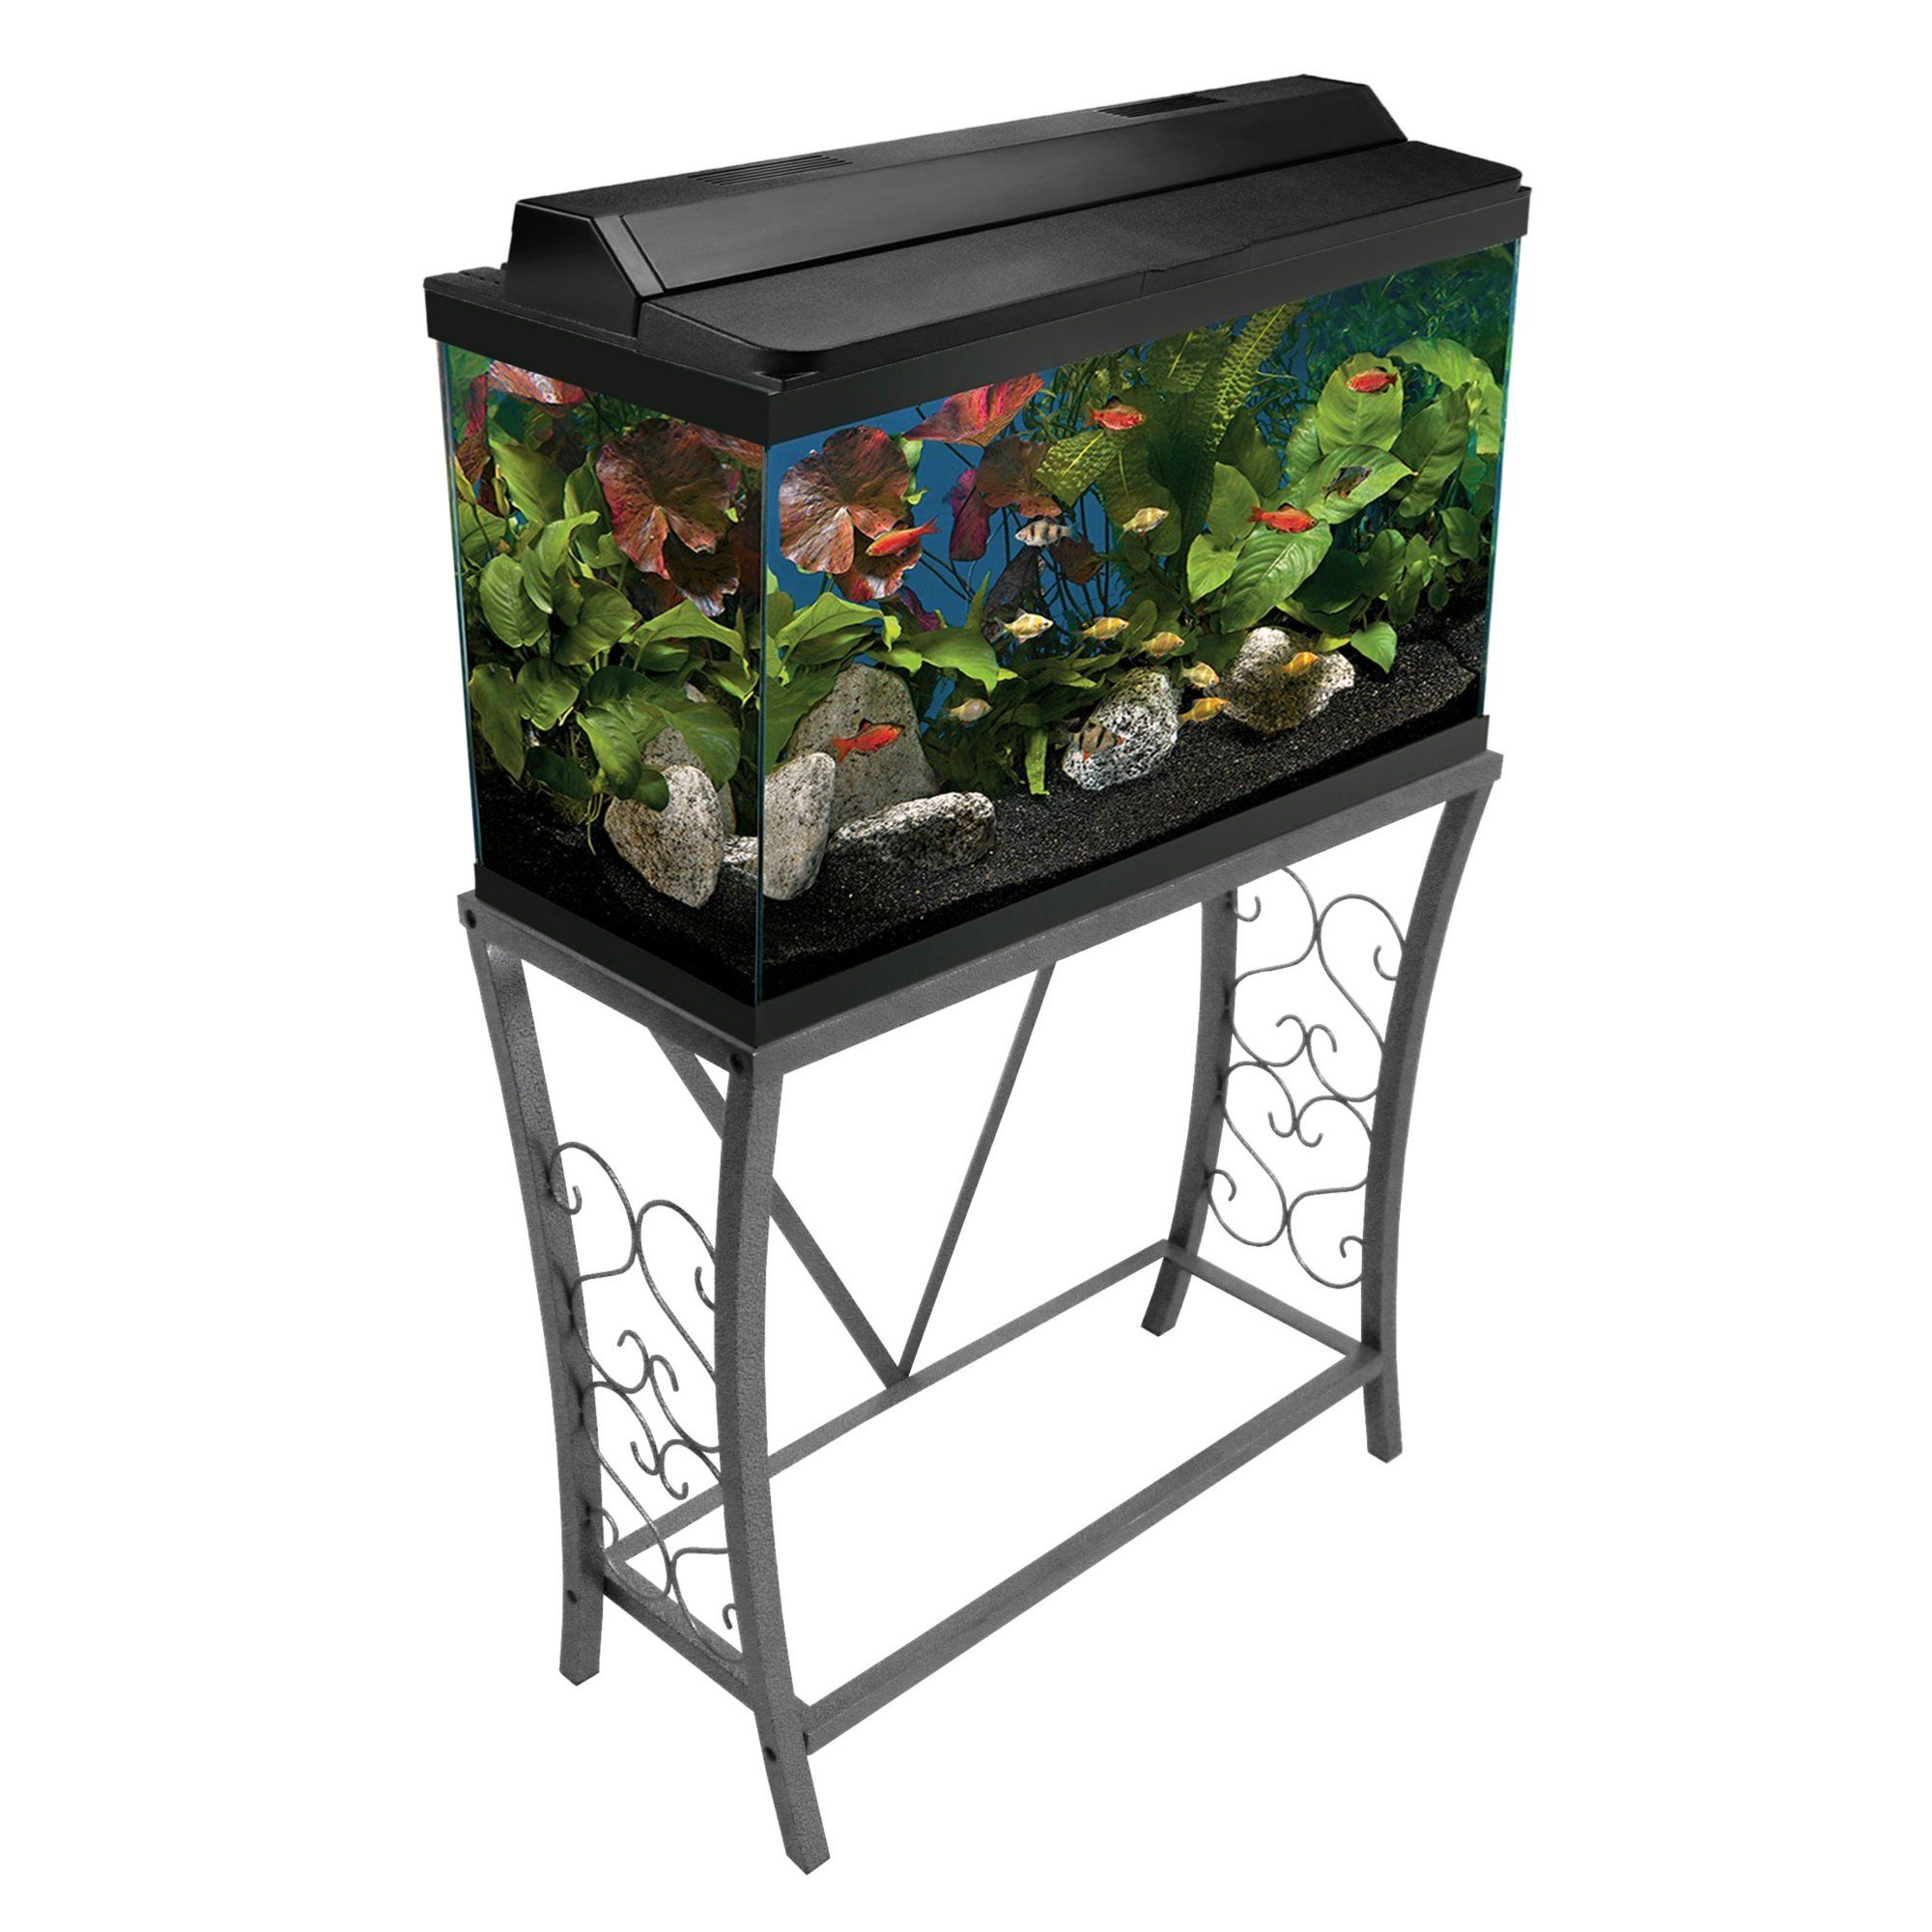 Aquatic Fundamentals Silver Vein Scroll Aquarium Stand For 29 Gallon Aquariums Petco Aquarium Stand Fish Tank Stand Best Aquarium Fish